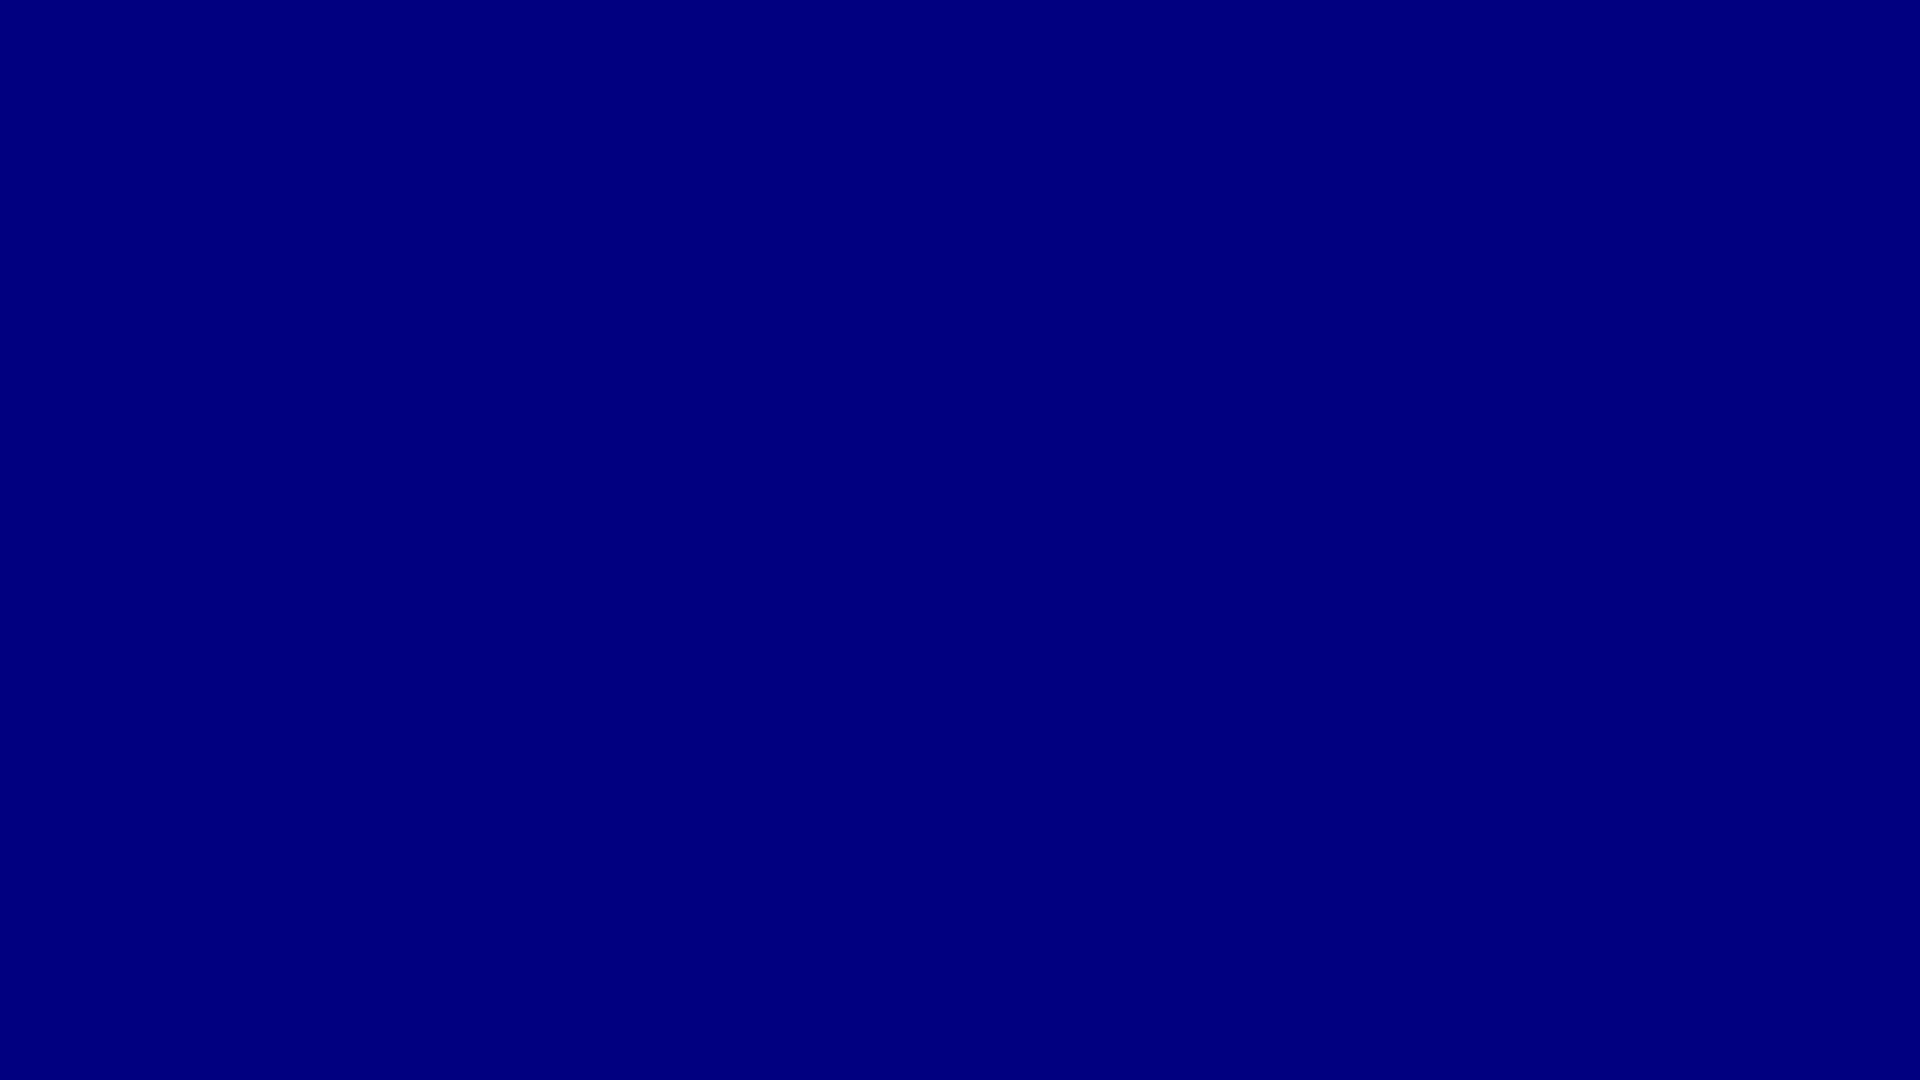 Pics Photos   Navy Blue Background 1920x1080